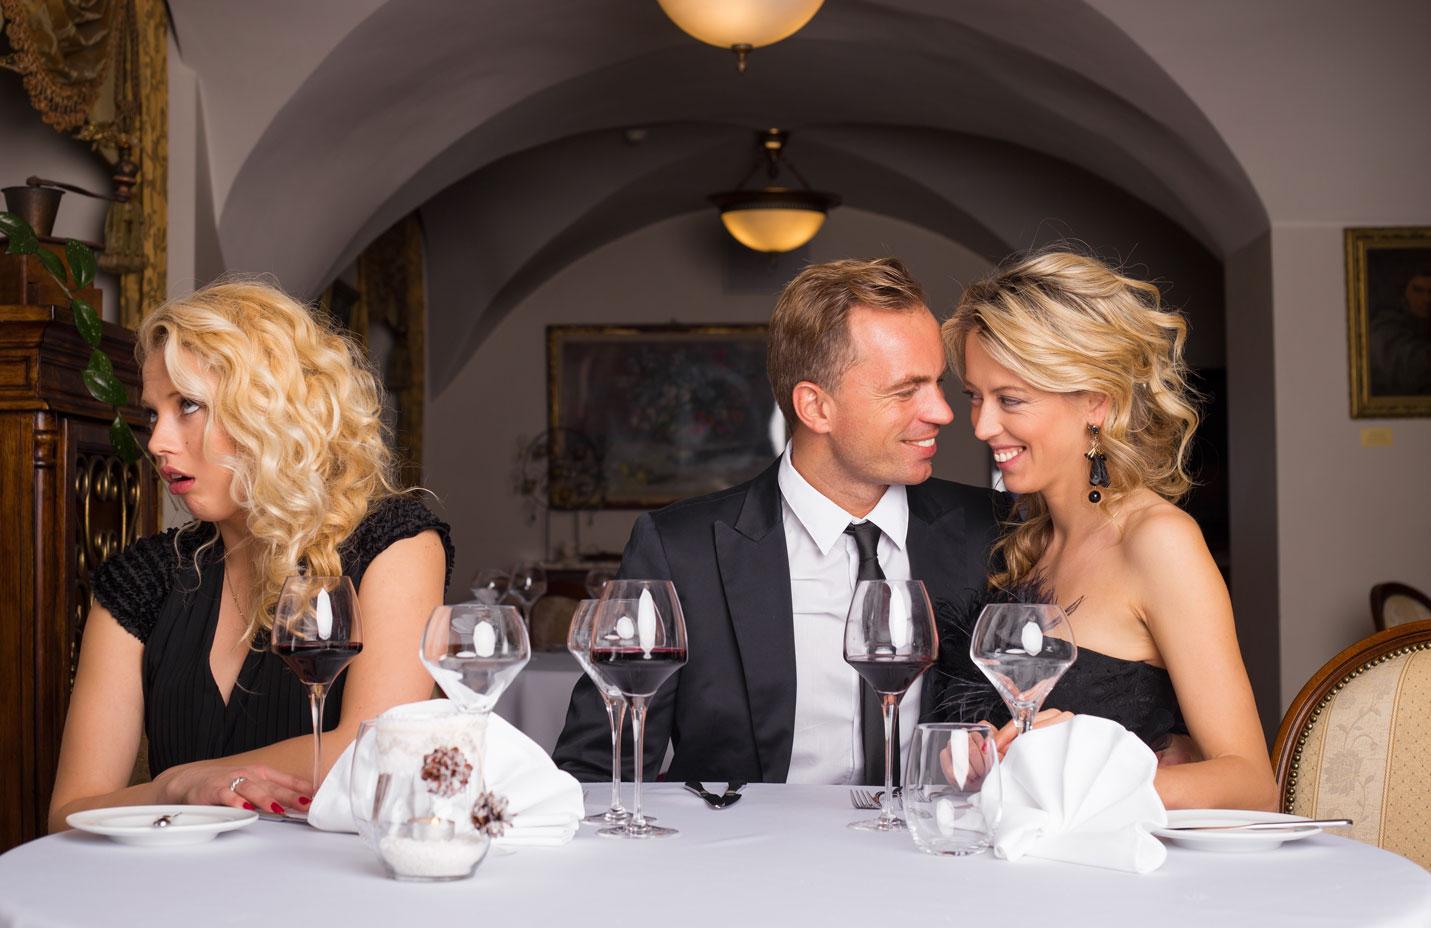 Warum heiraten? Verlobung Expartner